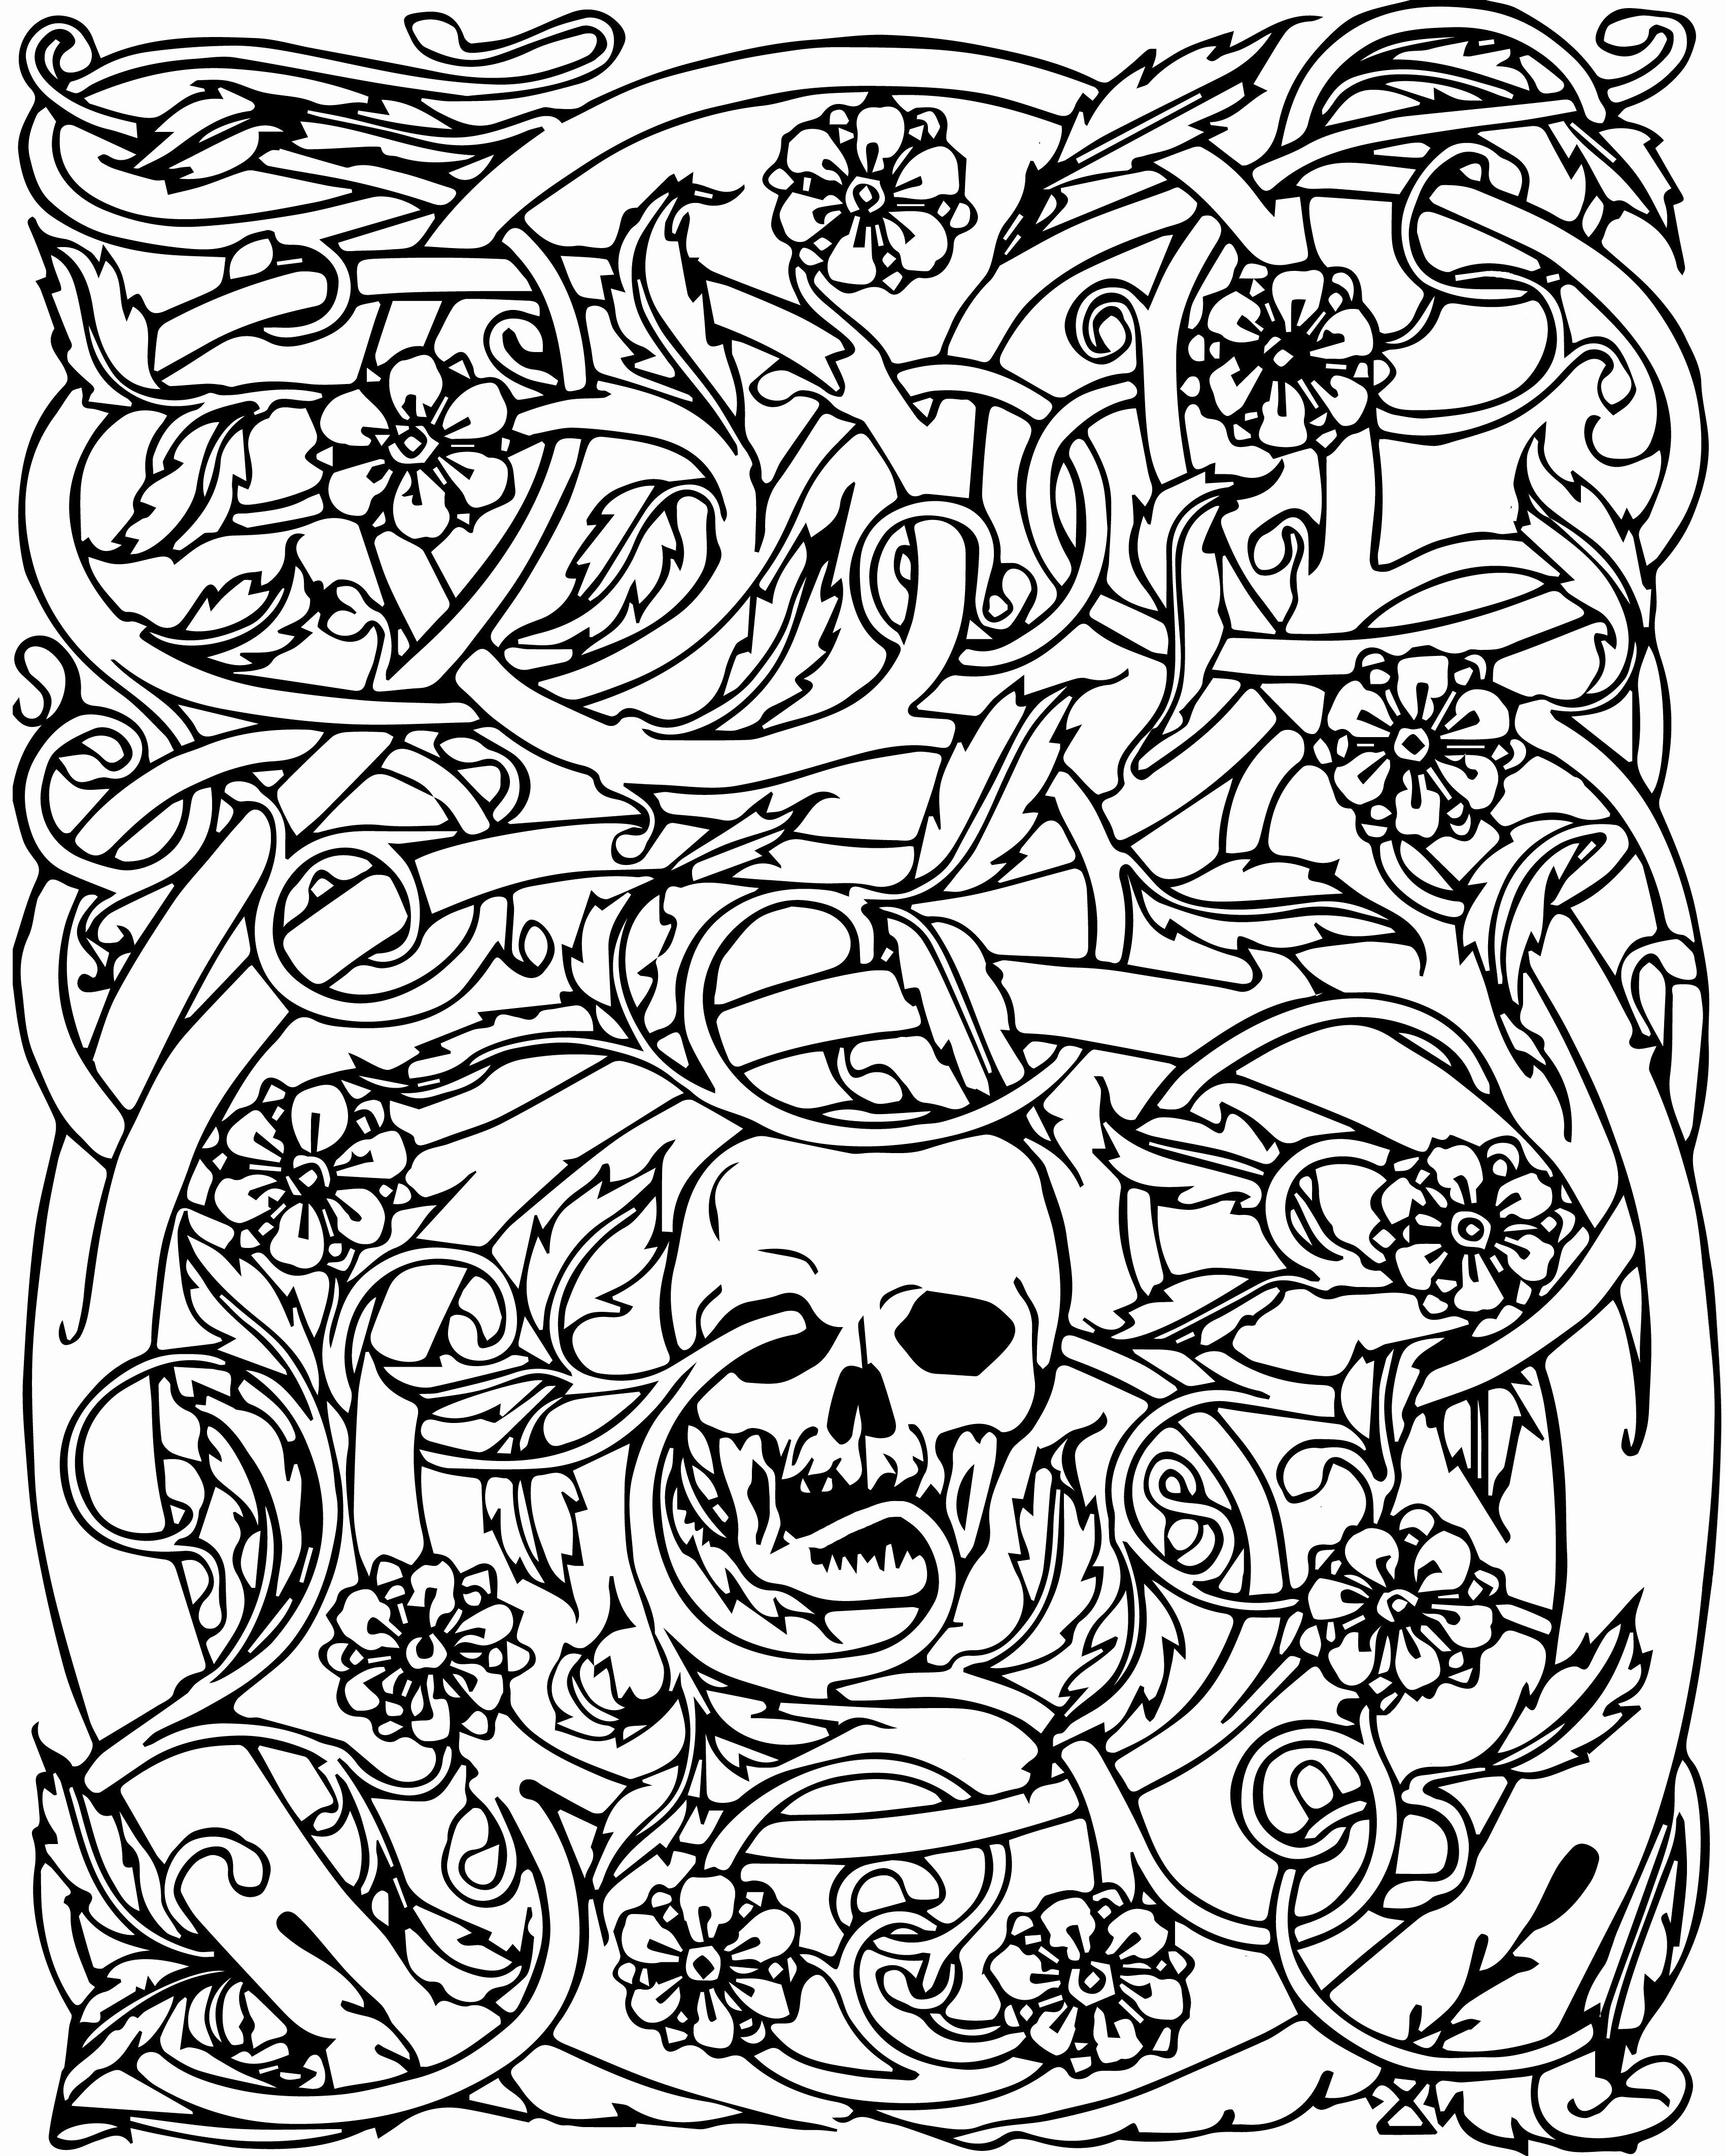 10 Elegant Headstone Vase Holder 2021 free download headstone vase holder of 10 fresh black marble vase bogekompresorturkiye com with flower vase new drawing pages inspirational cool vases flower vase coloring page